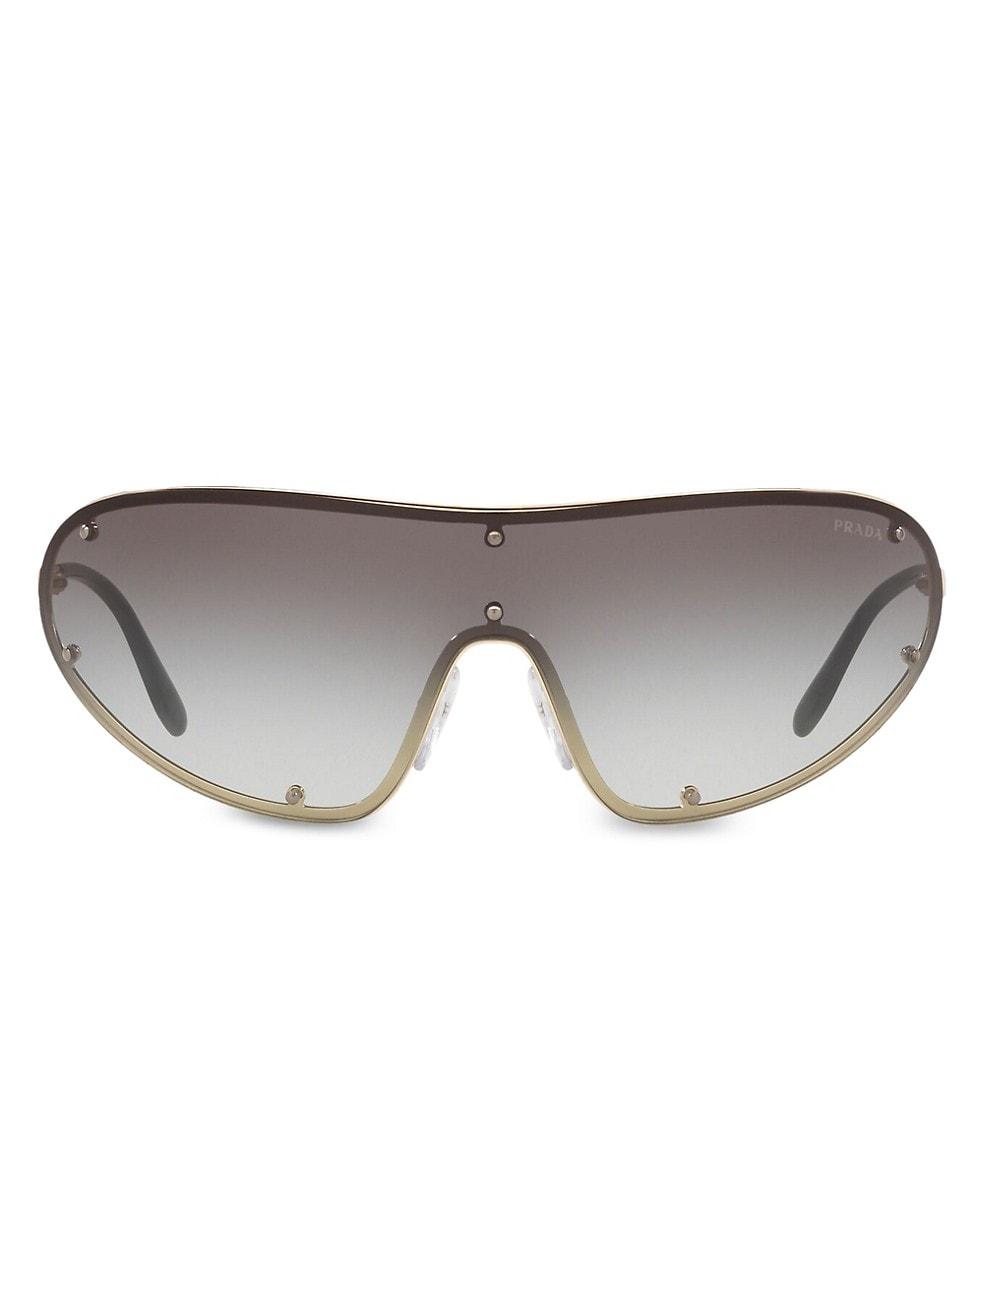 Catwalk Shield Sunglasses by Prada, available on saksfifthavenue.com Elsa Hosk Sunglasses Exact Product